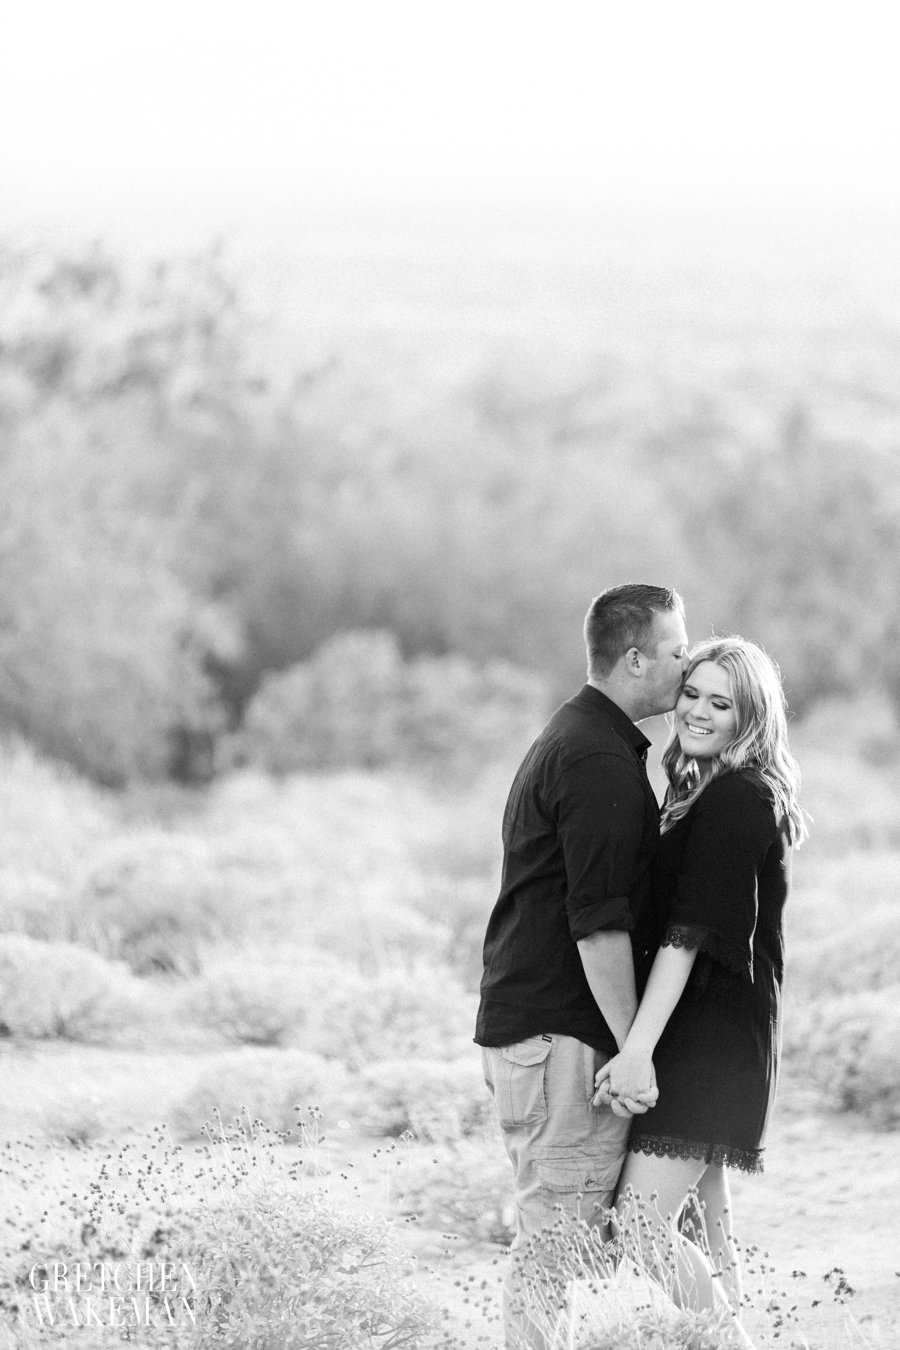 Simmons Engagement-054_GRETCHEN WAKEMAN PHOTOGRAPHY.jpg